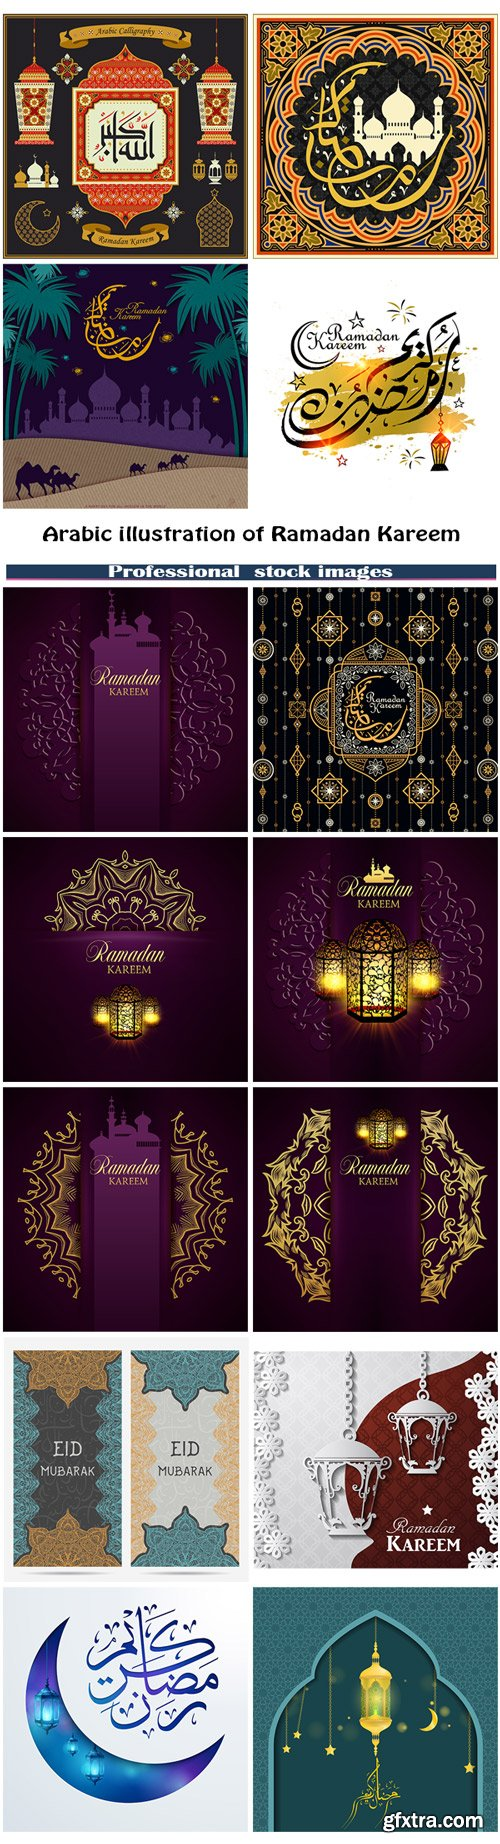 Arabic Illustration of Ramadan Kareem 14xEPS